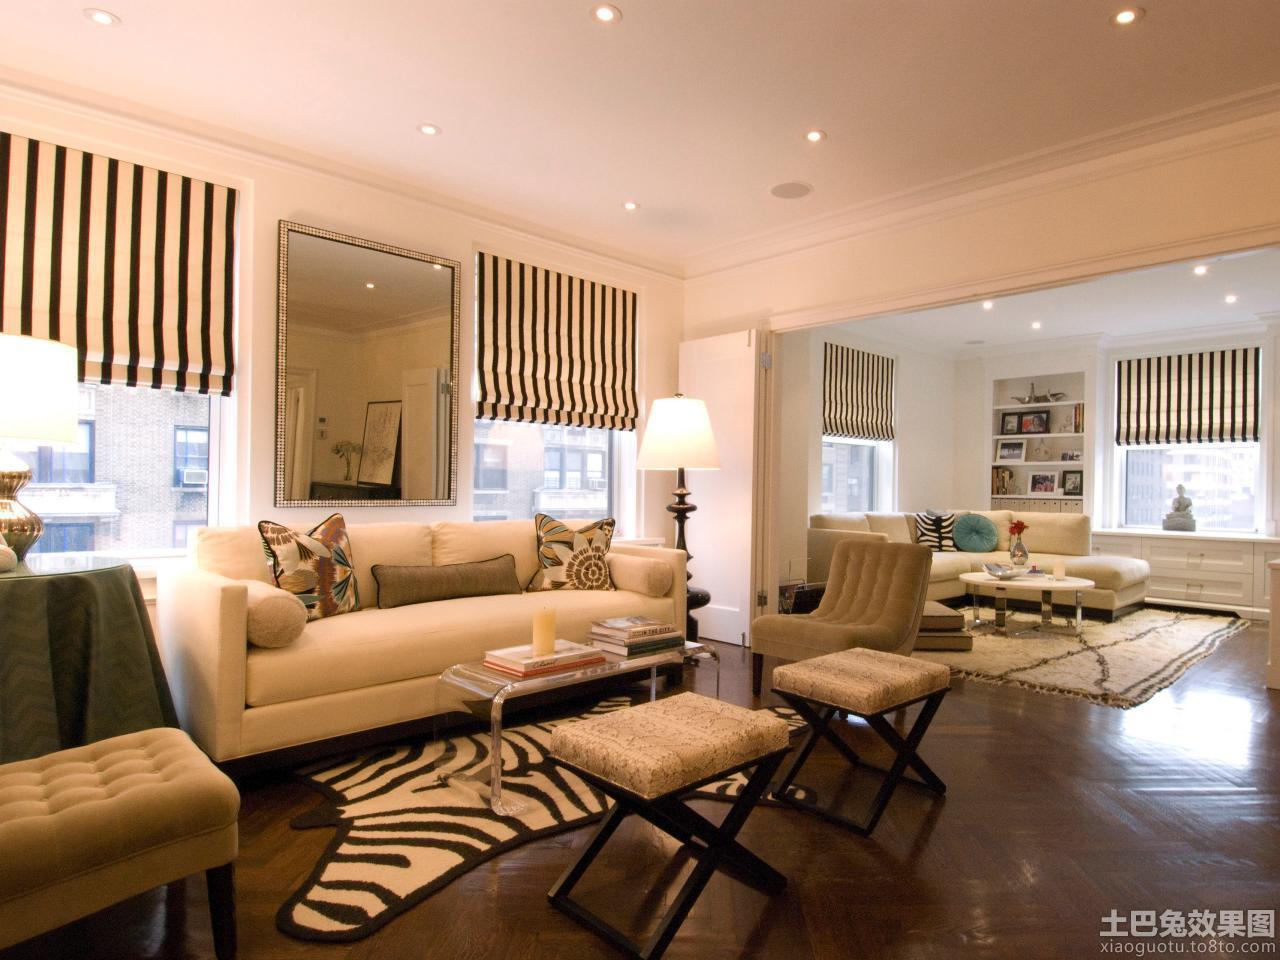 rugs for kitchen farmhouse faucet 客厅地毯现代简约_土巴兔装修效果图